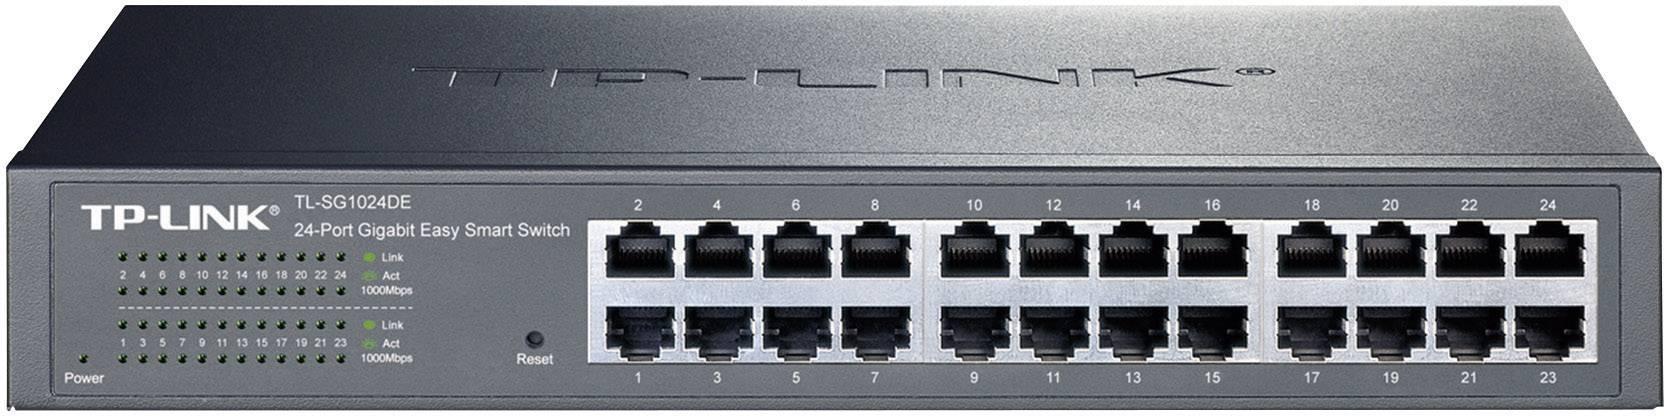 Síťový switch TP-LINK, TL-SG1024DE, 24 portů, 1 Gbit/s